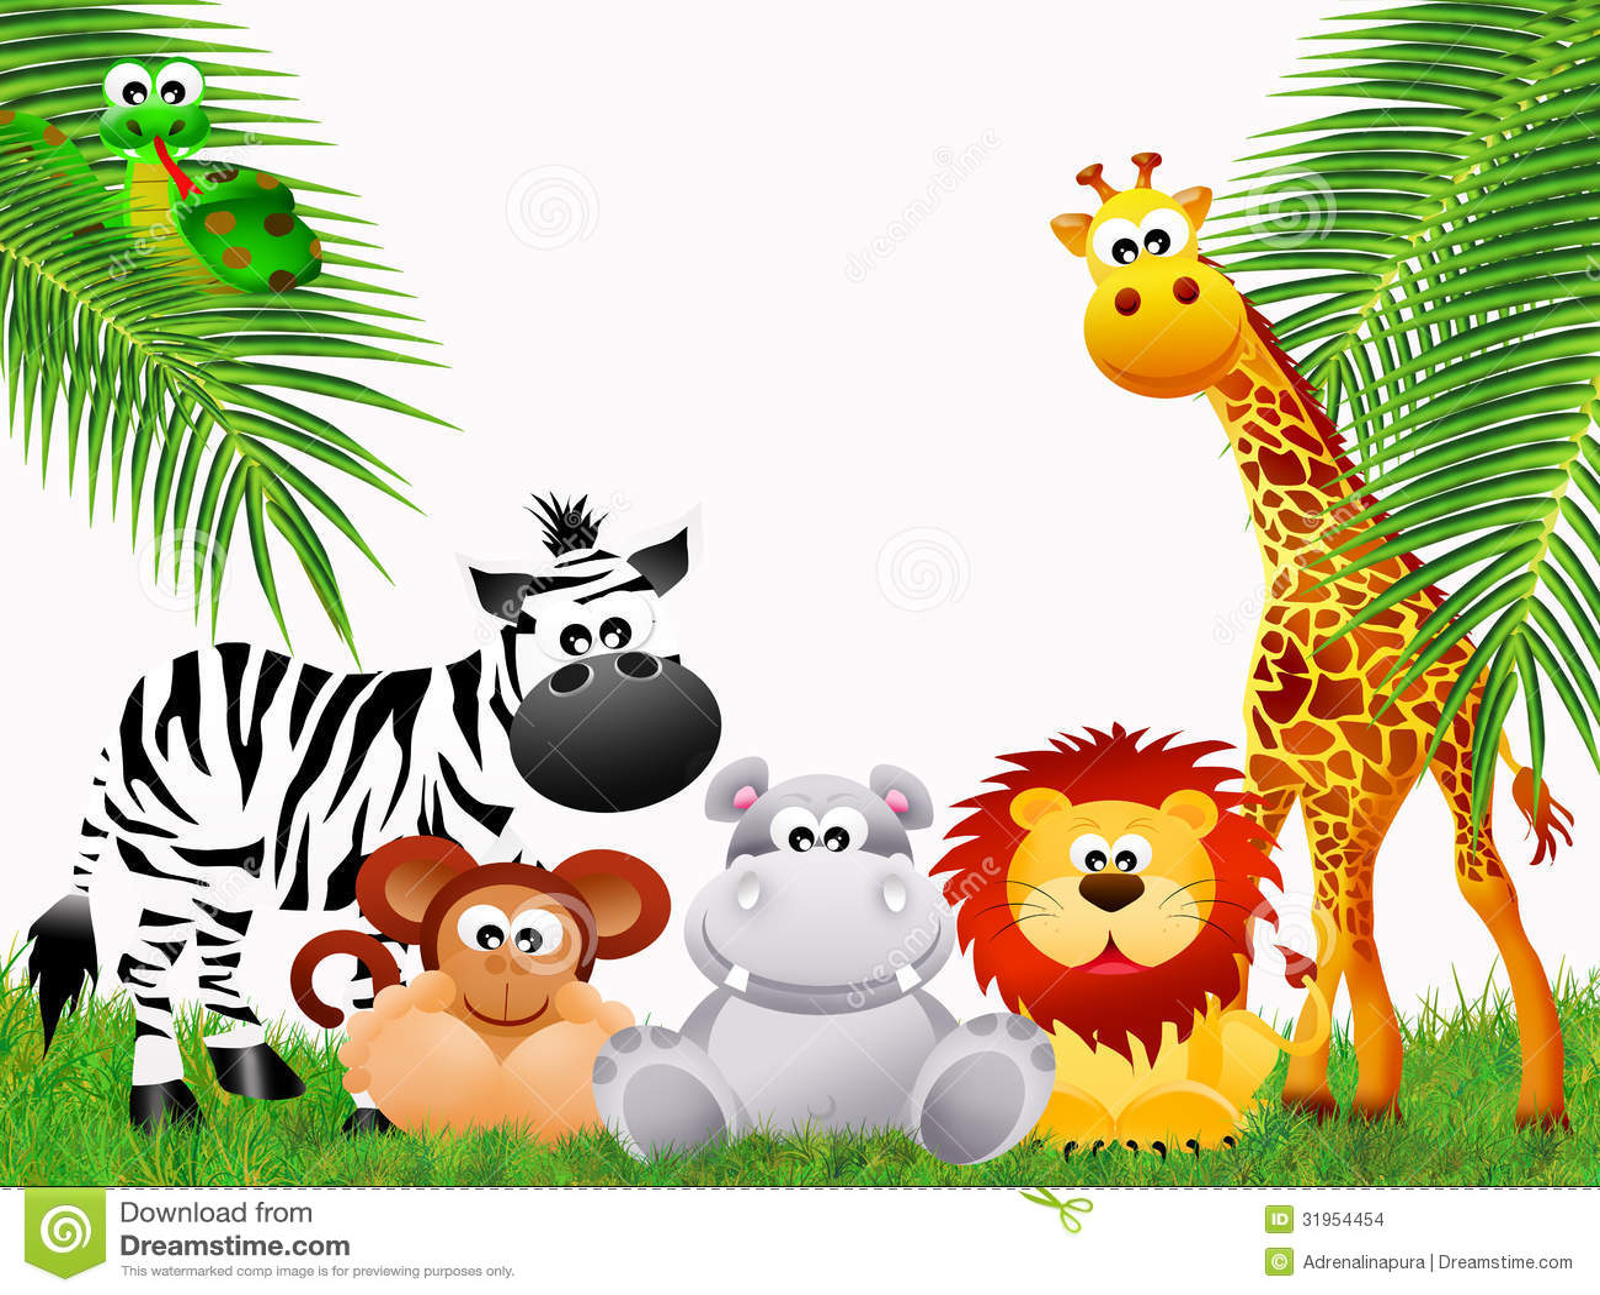 Zoo Animals Cartoon Stock Images